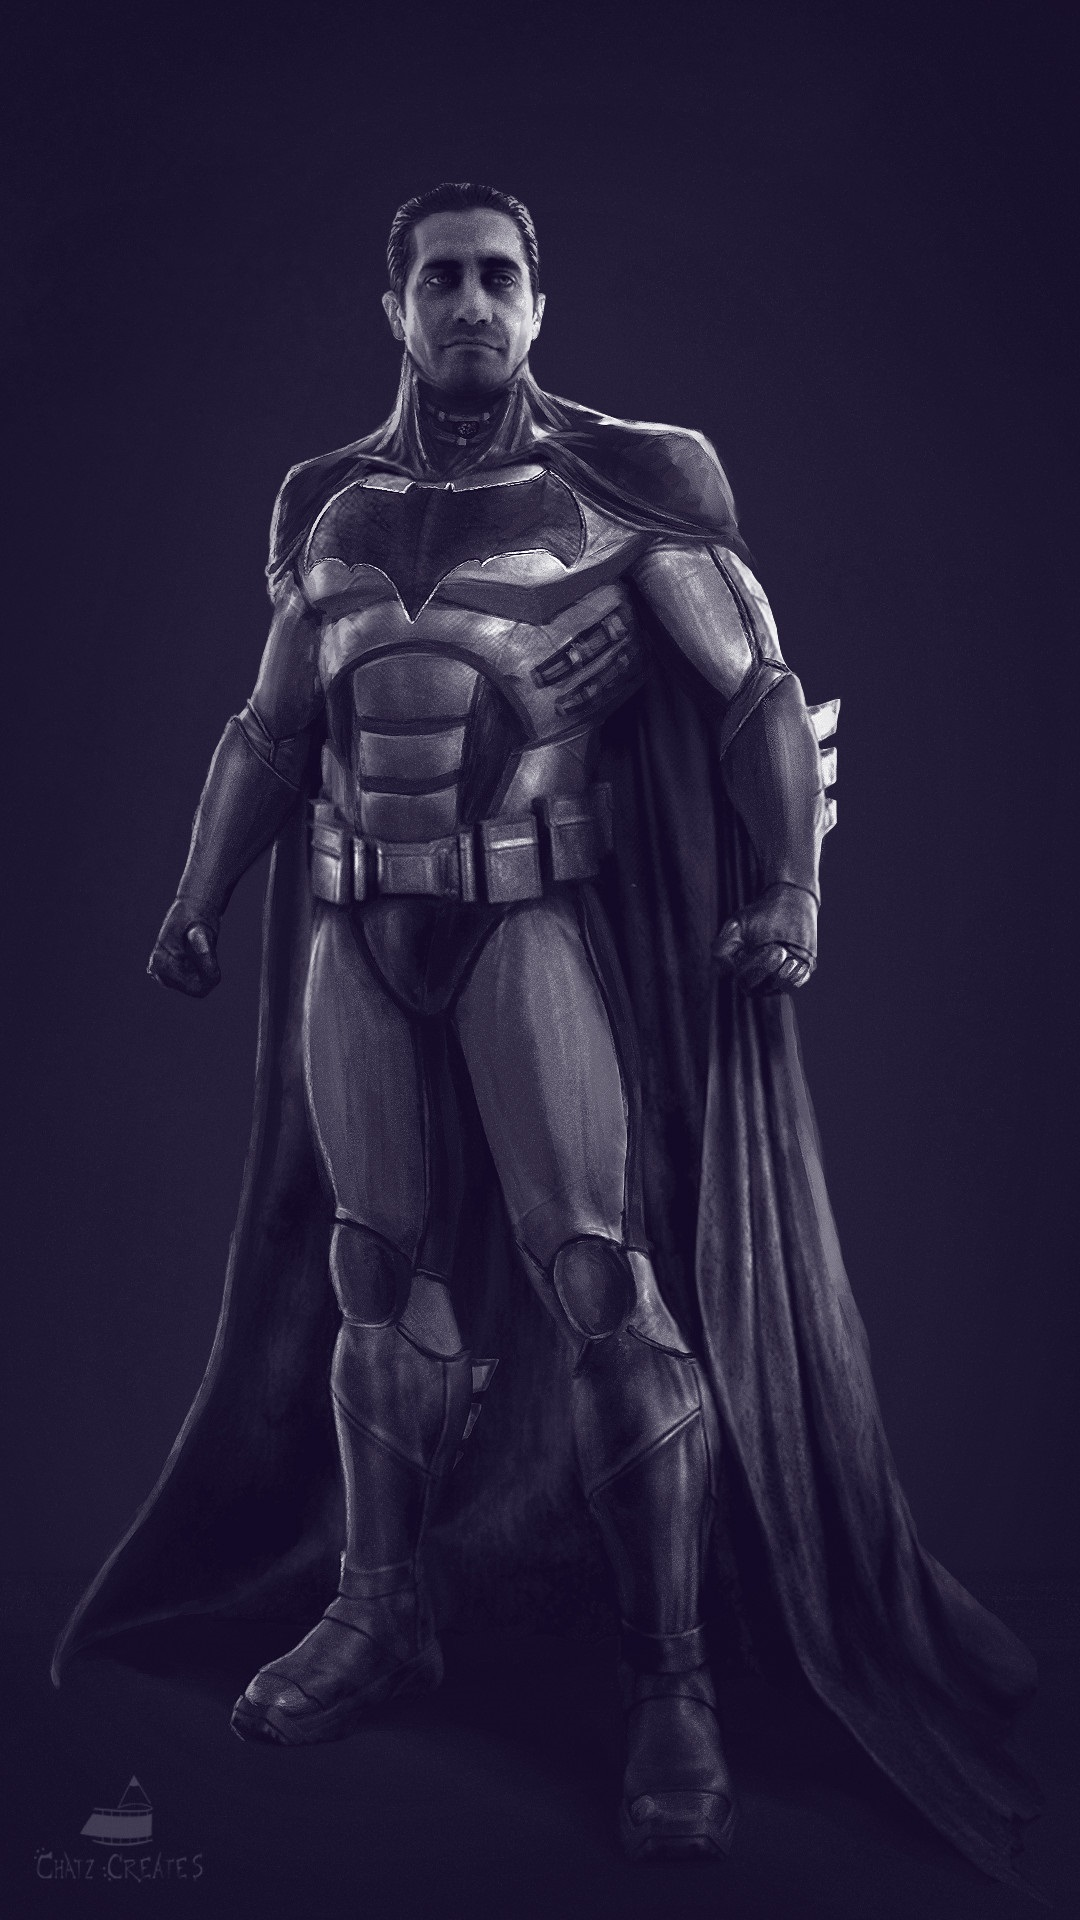 Another fan-art depicting Bat-Gyllenhaal